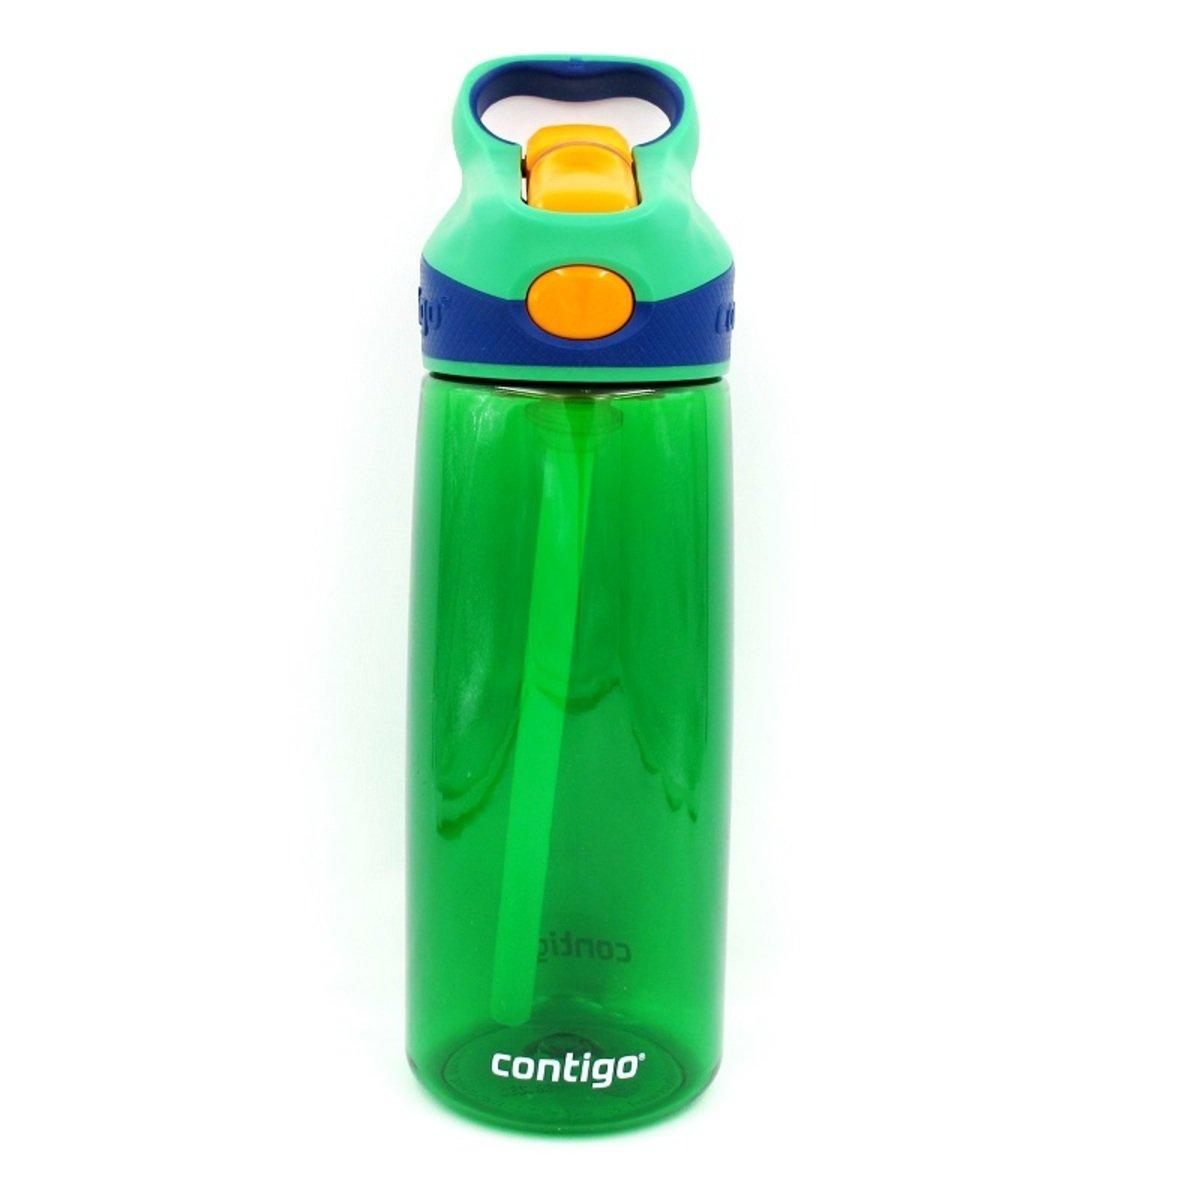 Striker 兒童自動吸管杯 - 墨綠色